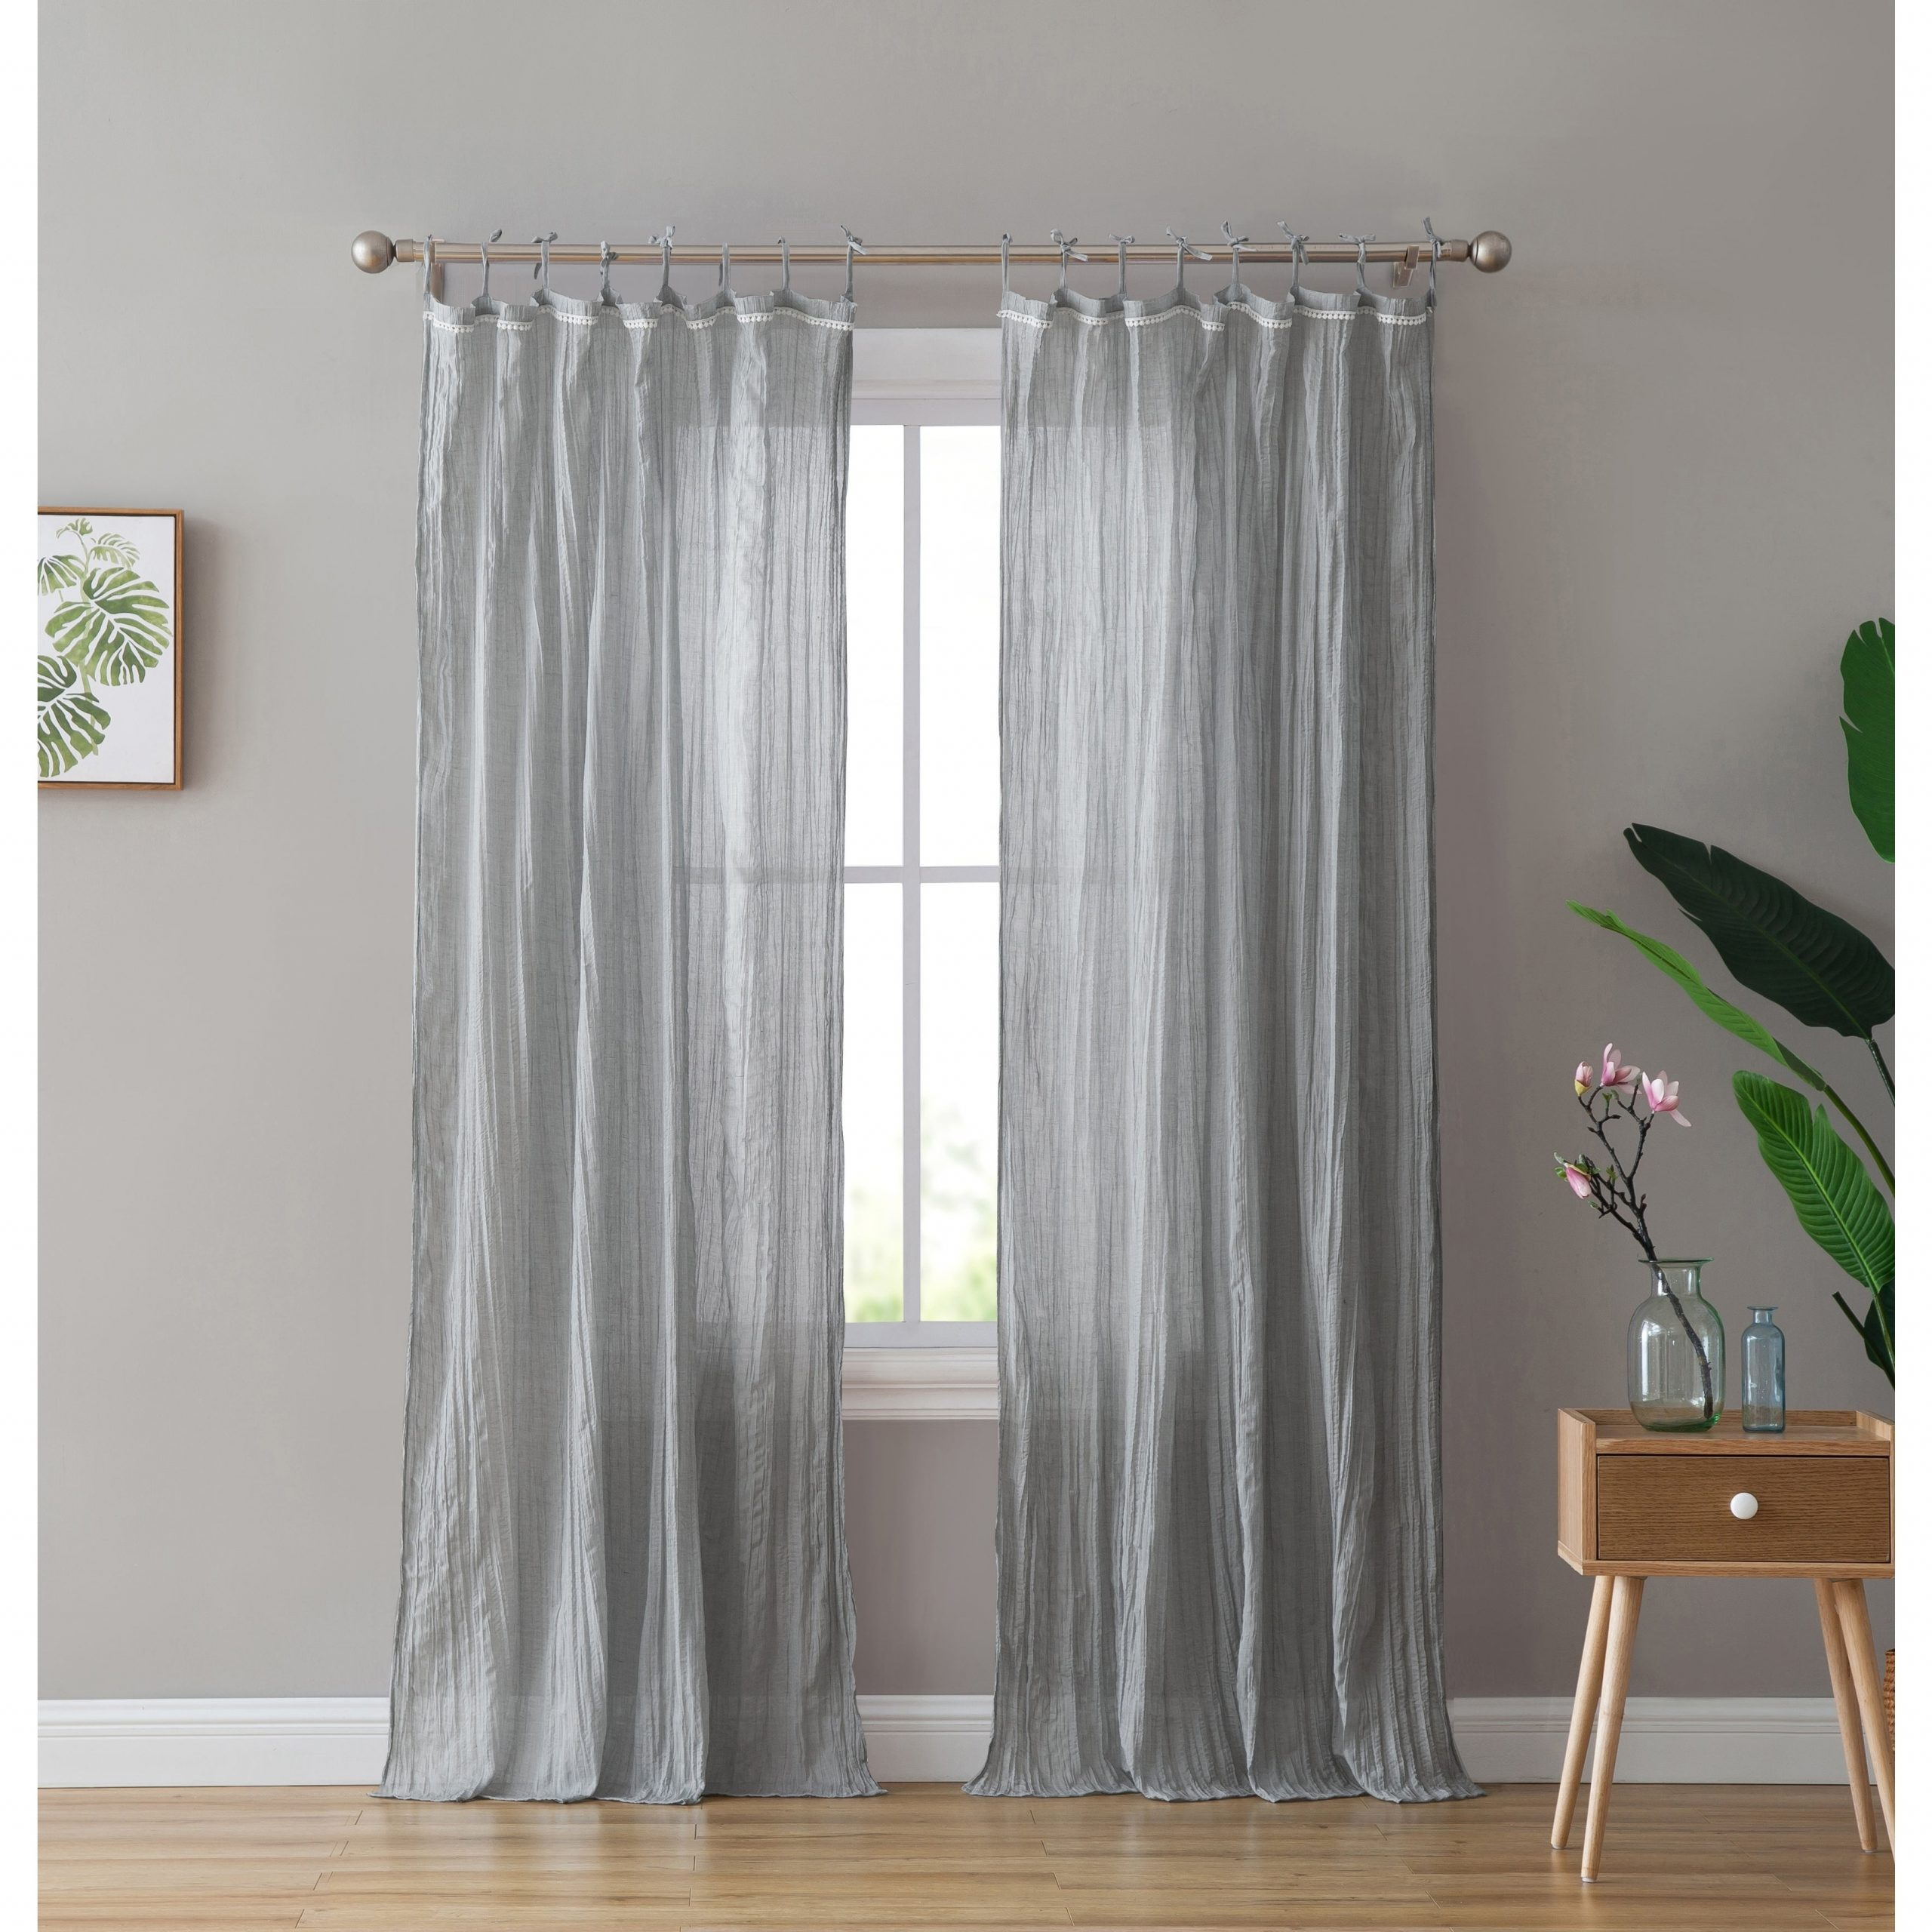 Elrene Jolie Tie Top Curtain Panels Regarding Current Peach & Oak Clover Tie Top Single Curtain Panel (View 17 of 20)